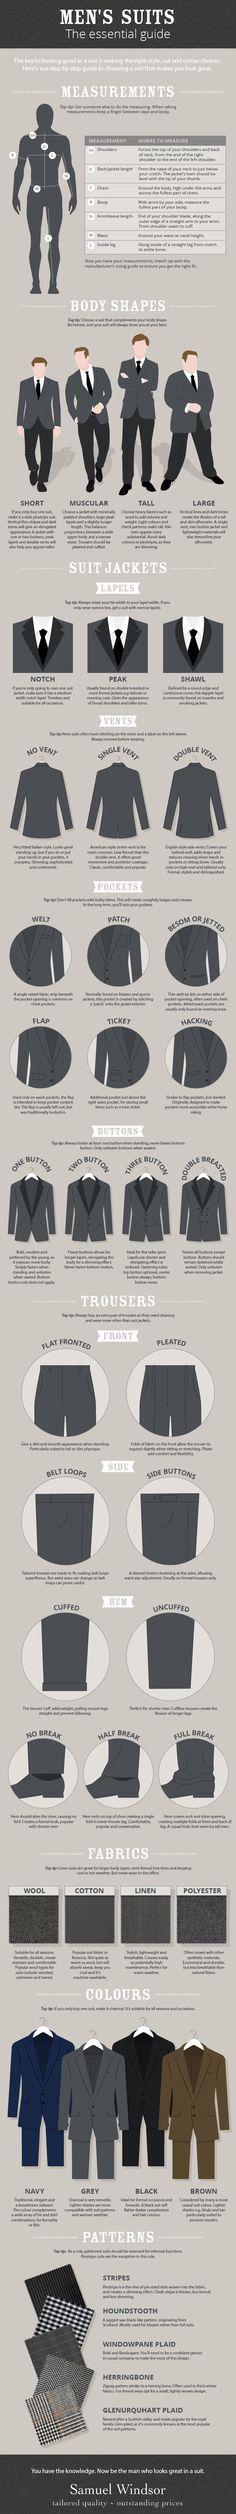 Infografik: Welcher Anzug passt zu dir : Business Punk #Style #Fashion #Menswear Re-pinned by www.avacationrental4me.com